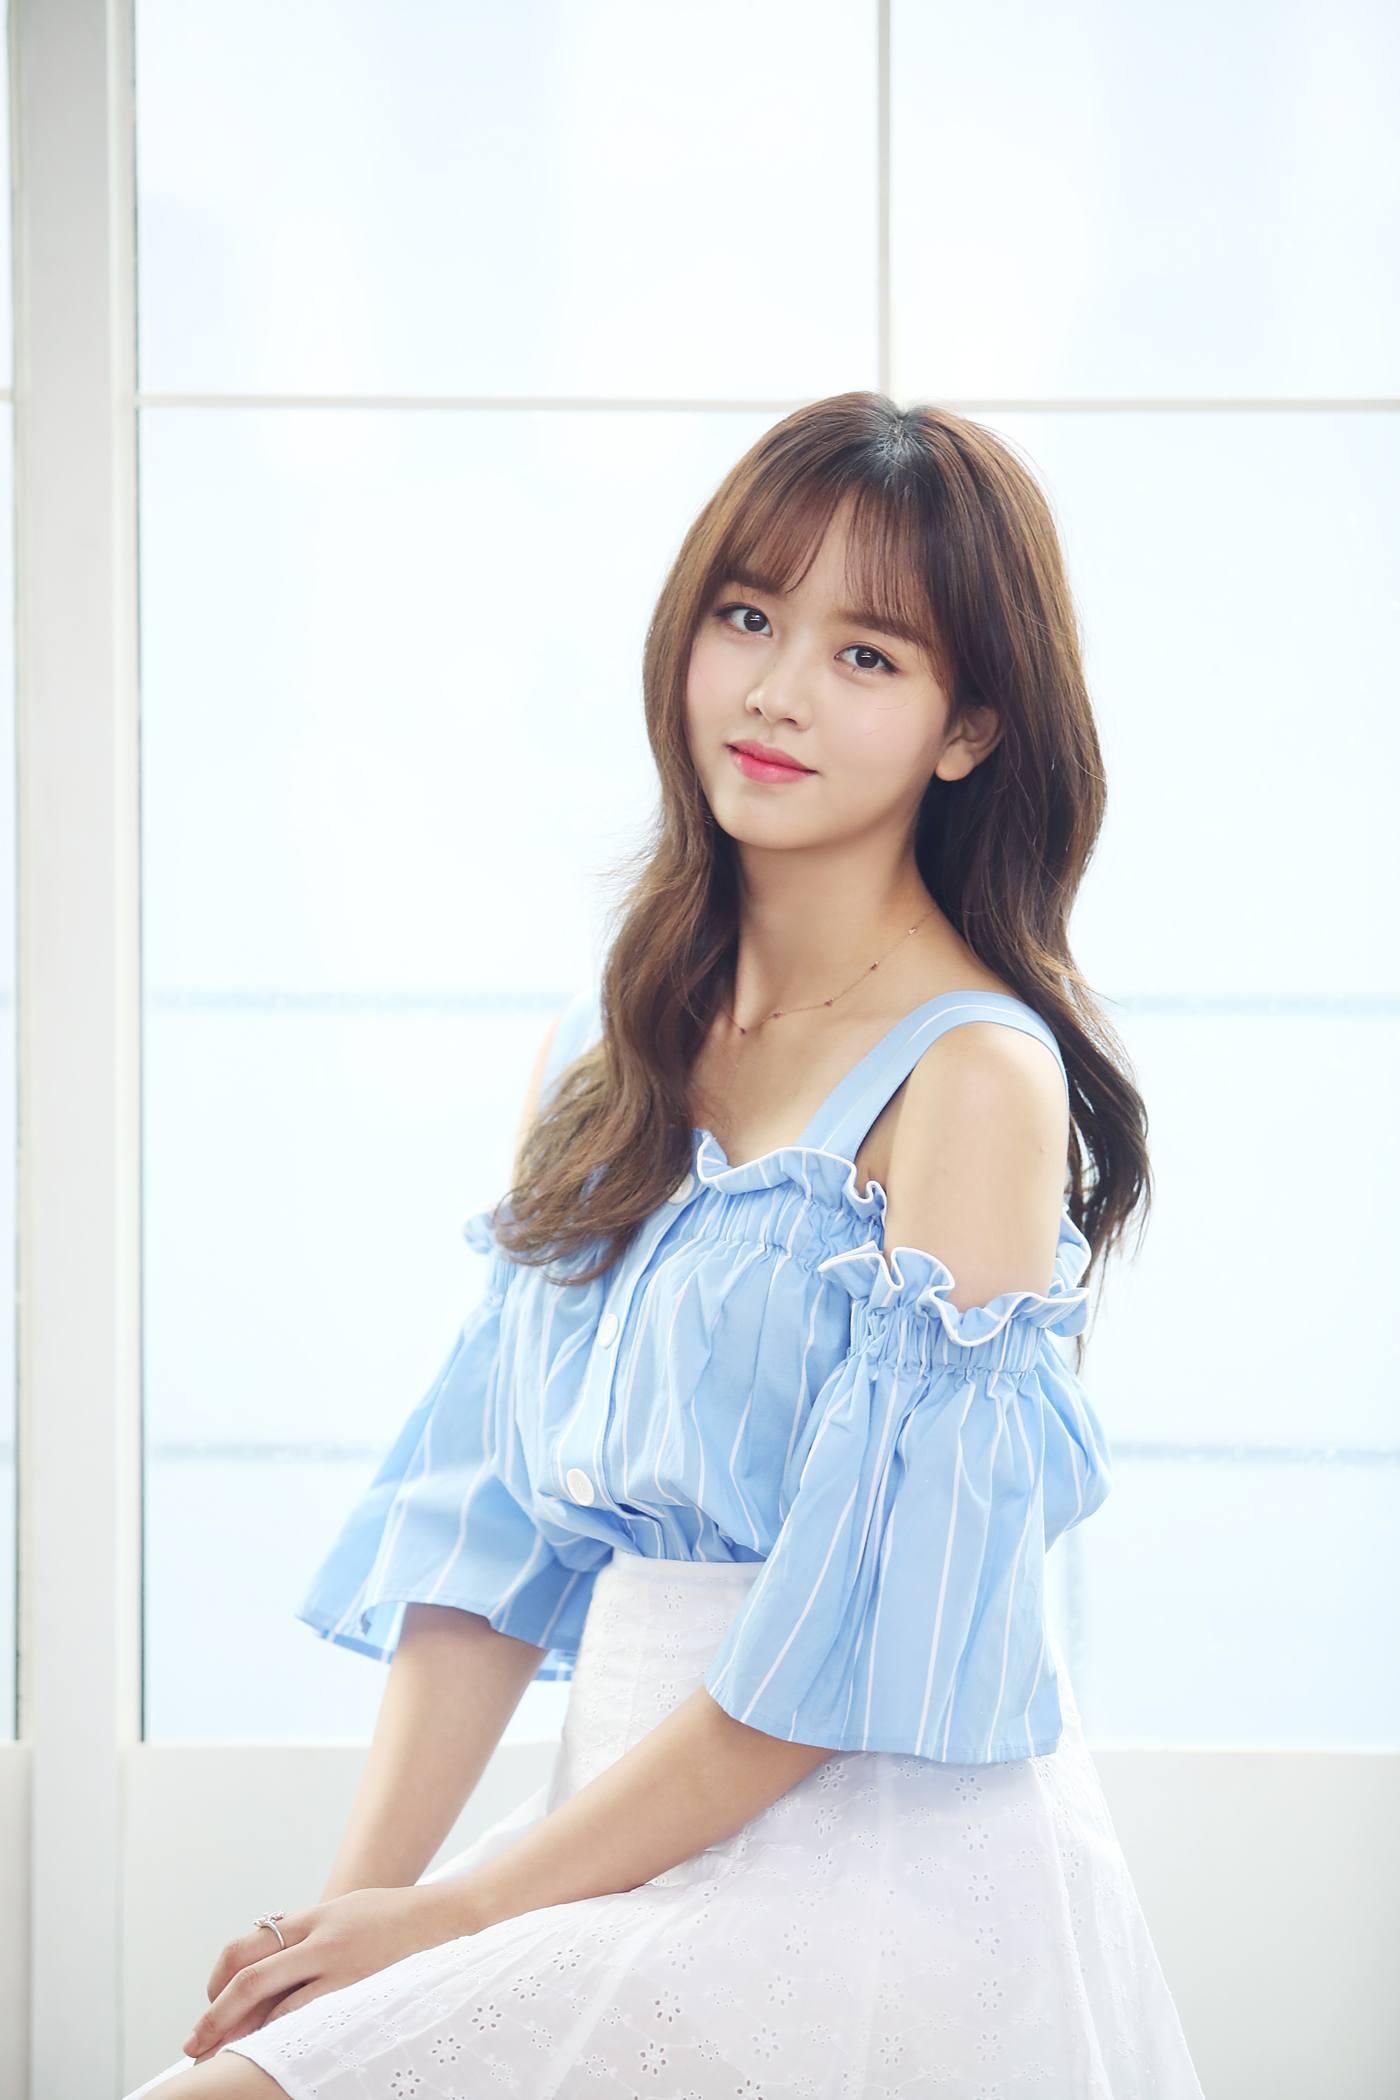 Sad Love Girl Wallpaper Hd Actress Kim So Hyun S Amazing Transformation With Age